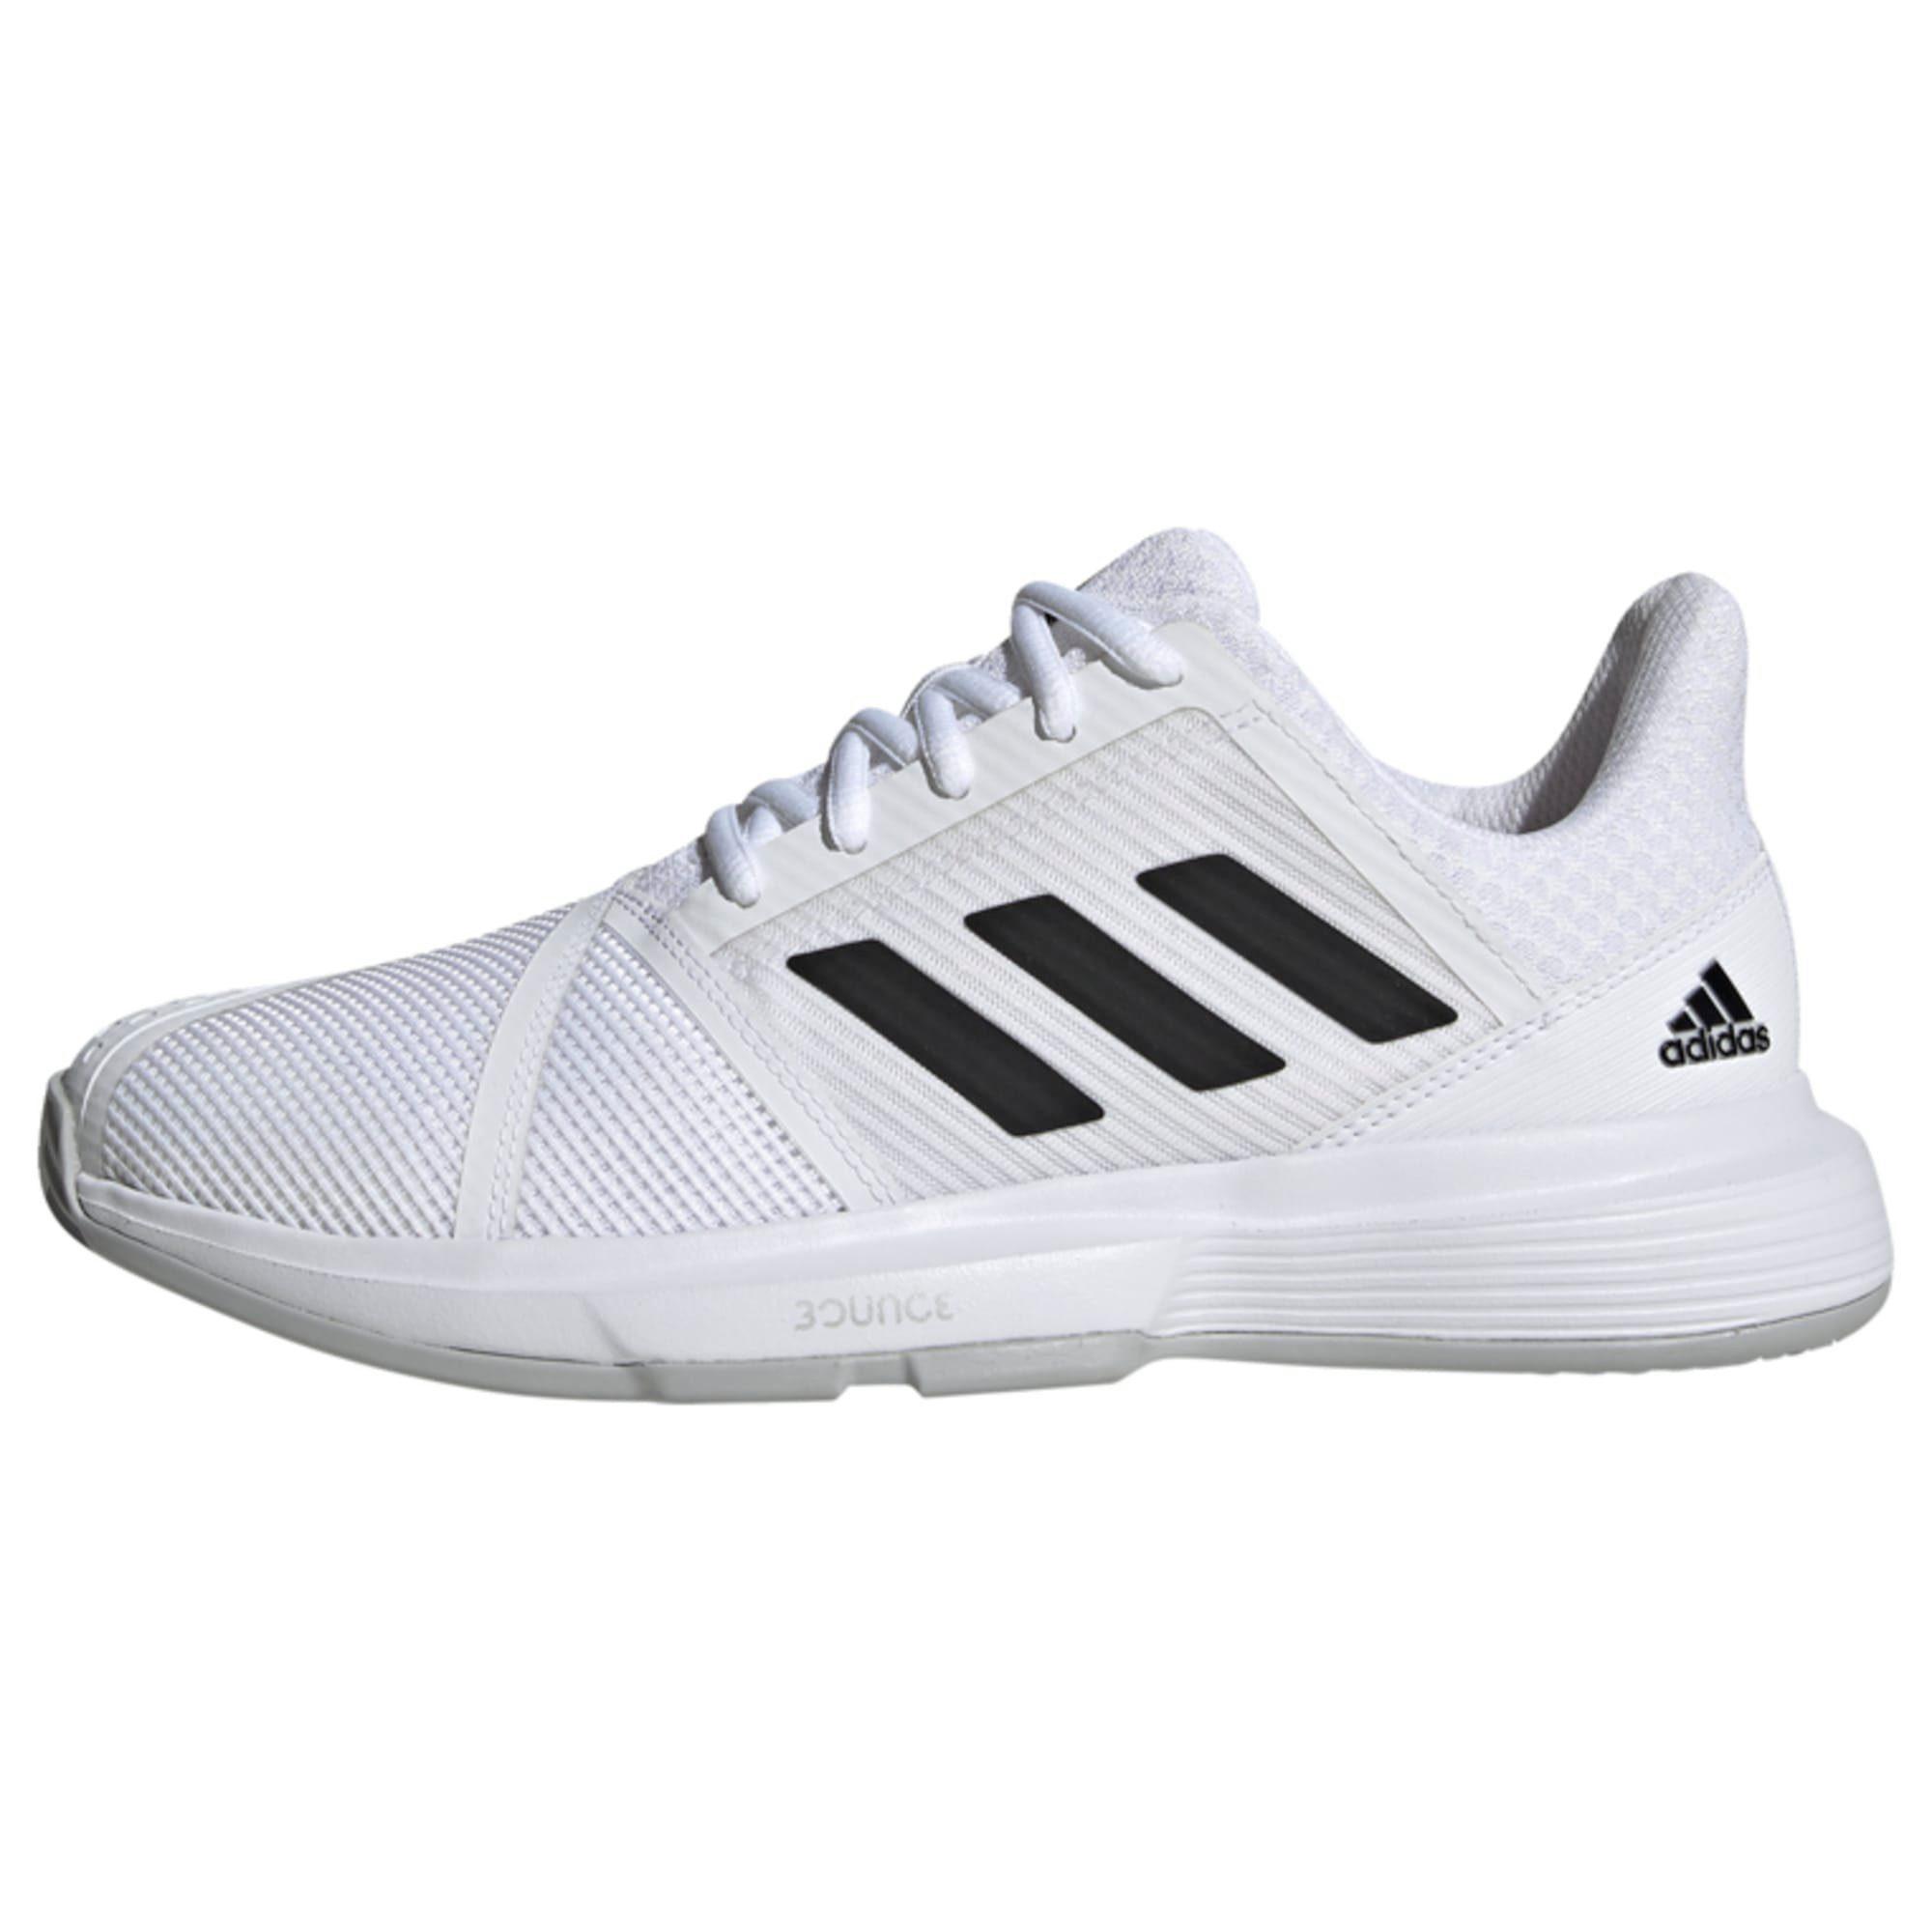 adidas Performance »CourtJam Bounce Schuh« Fitnessschuh SPECIALIST SPORT ADIDAS online kaufen   OTTO